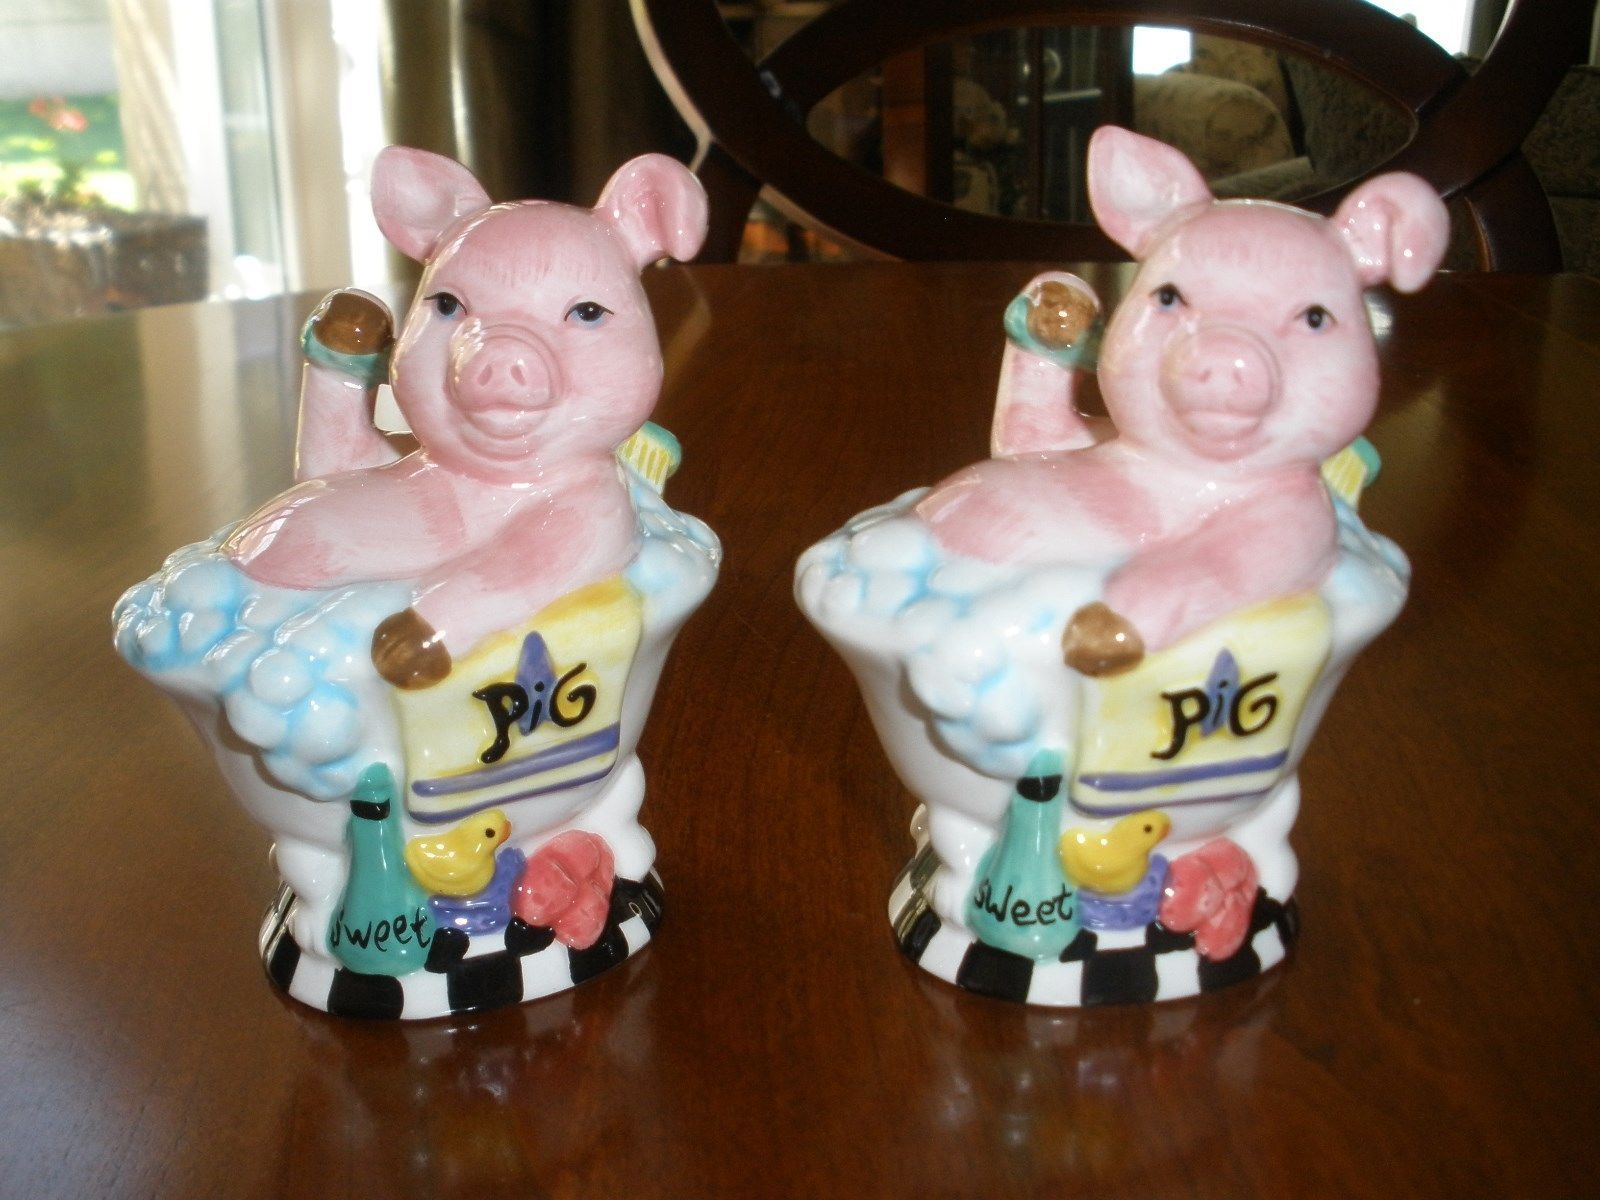 Ceramic Pig Piggy in A Bubble Bath Tub Salt Pepper Shaker Set Too ...